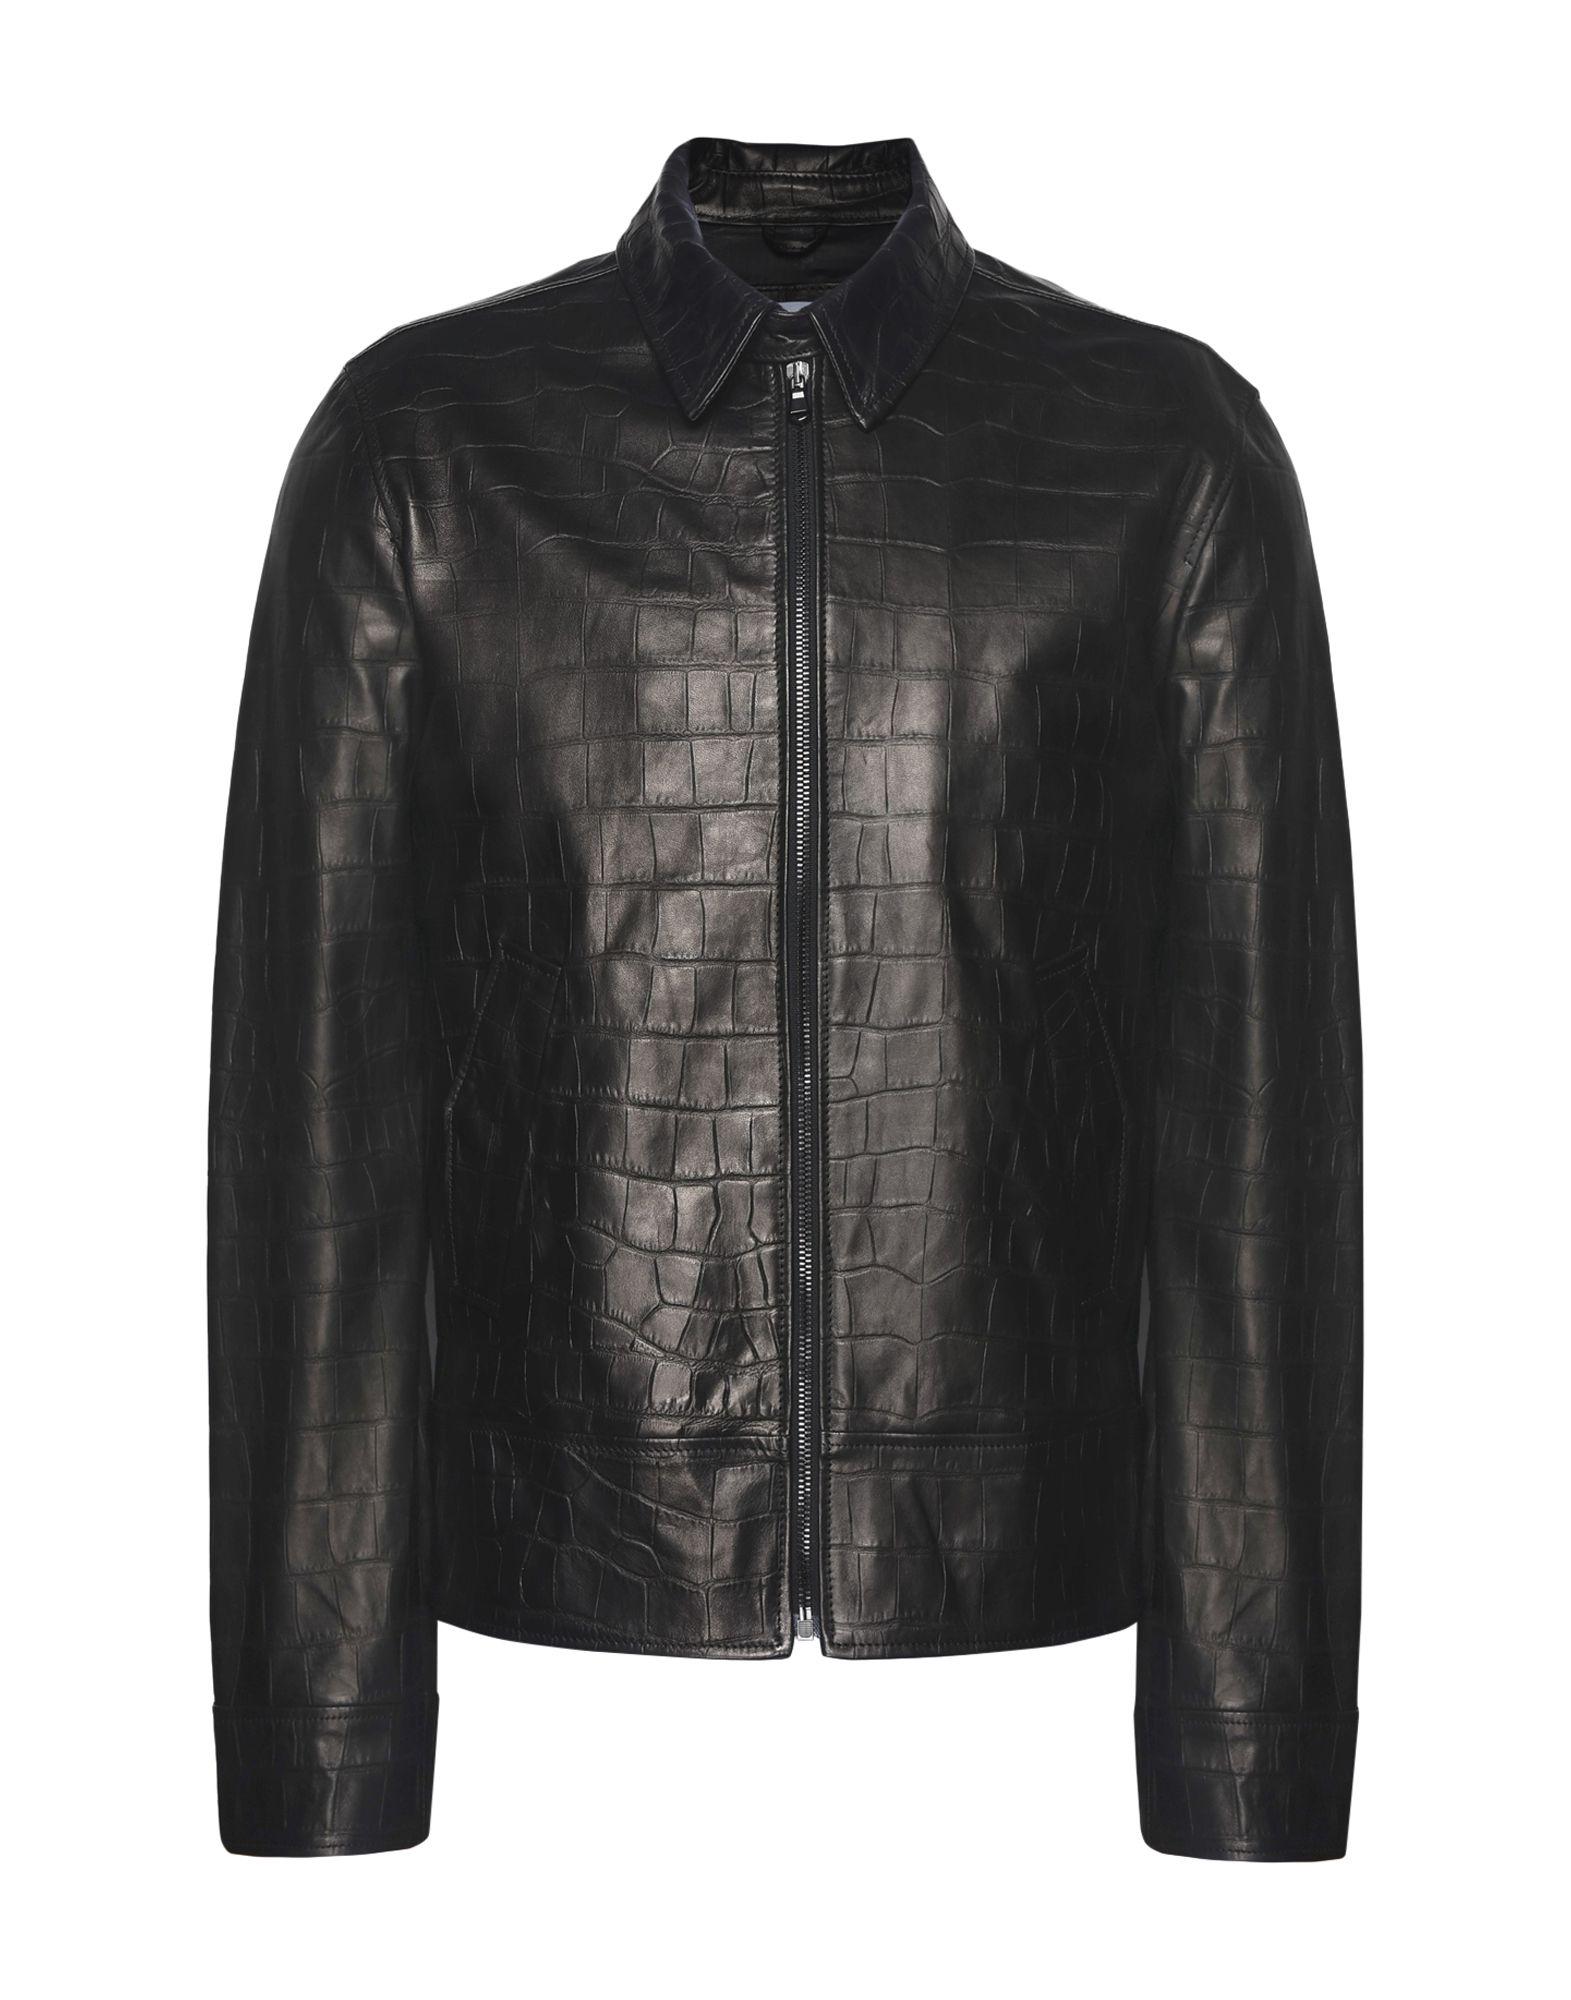 PIERRE DARRÉ - Leather jacket